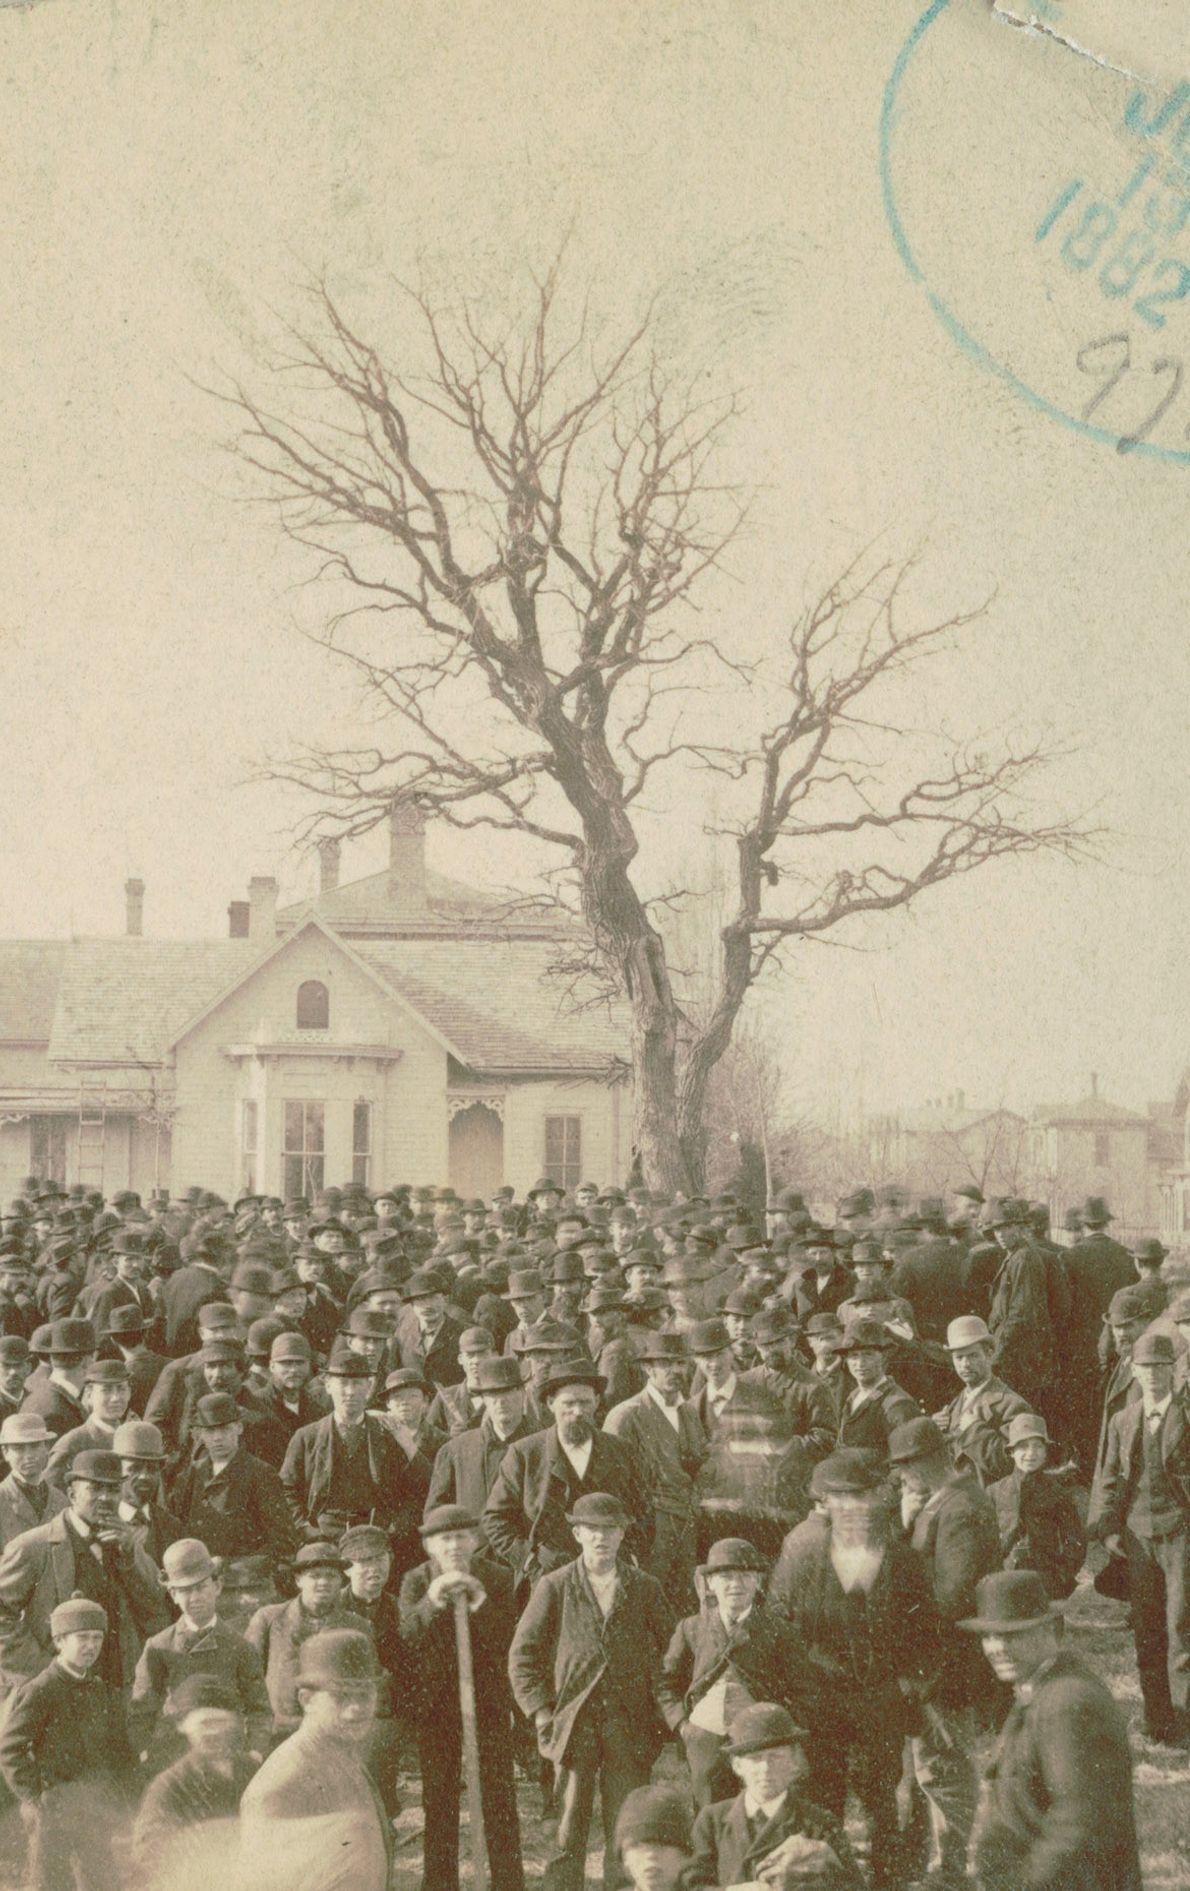 Linchamiento de Frank MacManus, Minneapolis, MN, 1882.